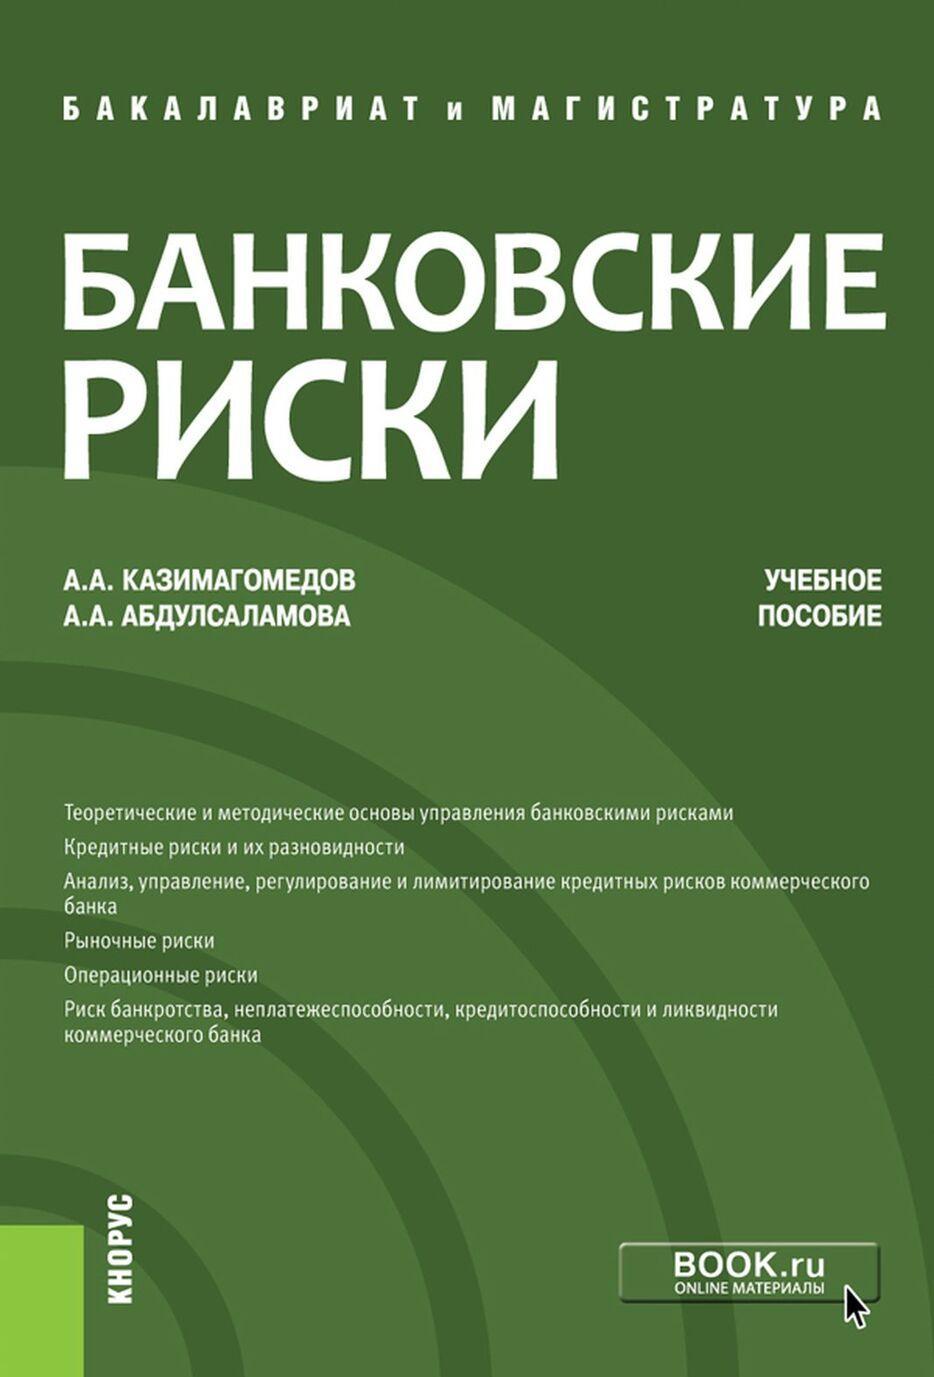 Bankovskie riski. Uchebnoe posobie | Kazimagomedov Abdulla Asedullaevich, Abdulsalamova Aila Abdullaevna